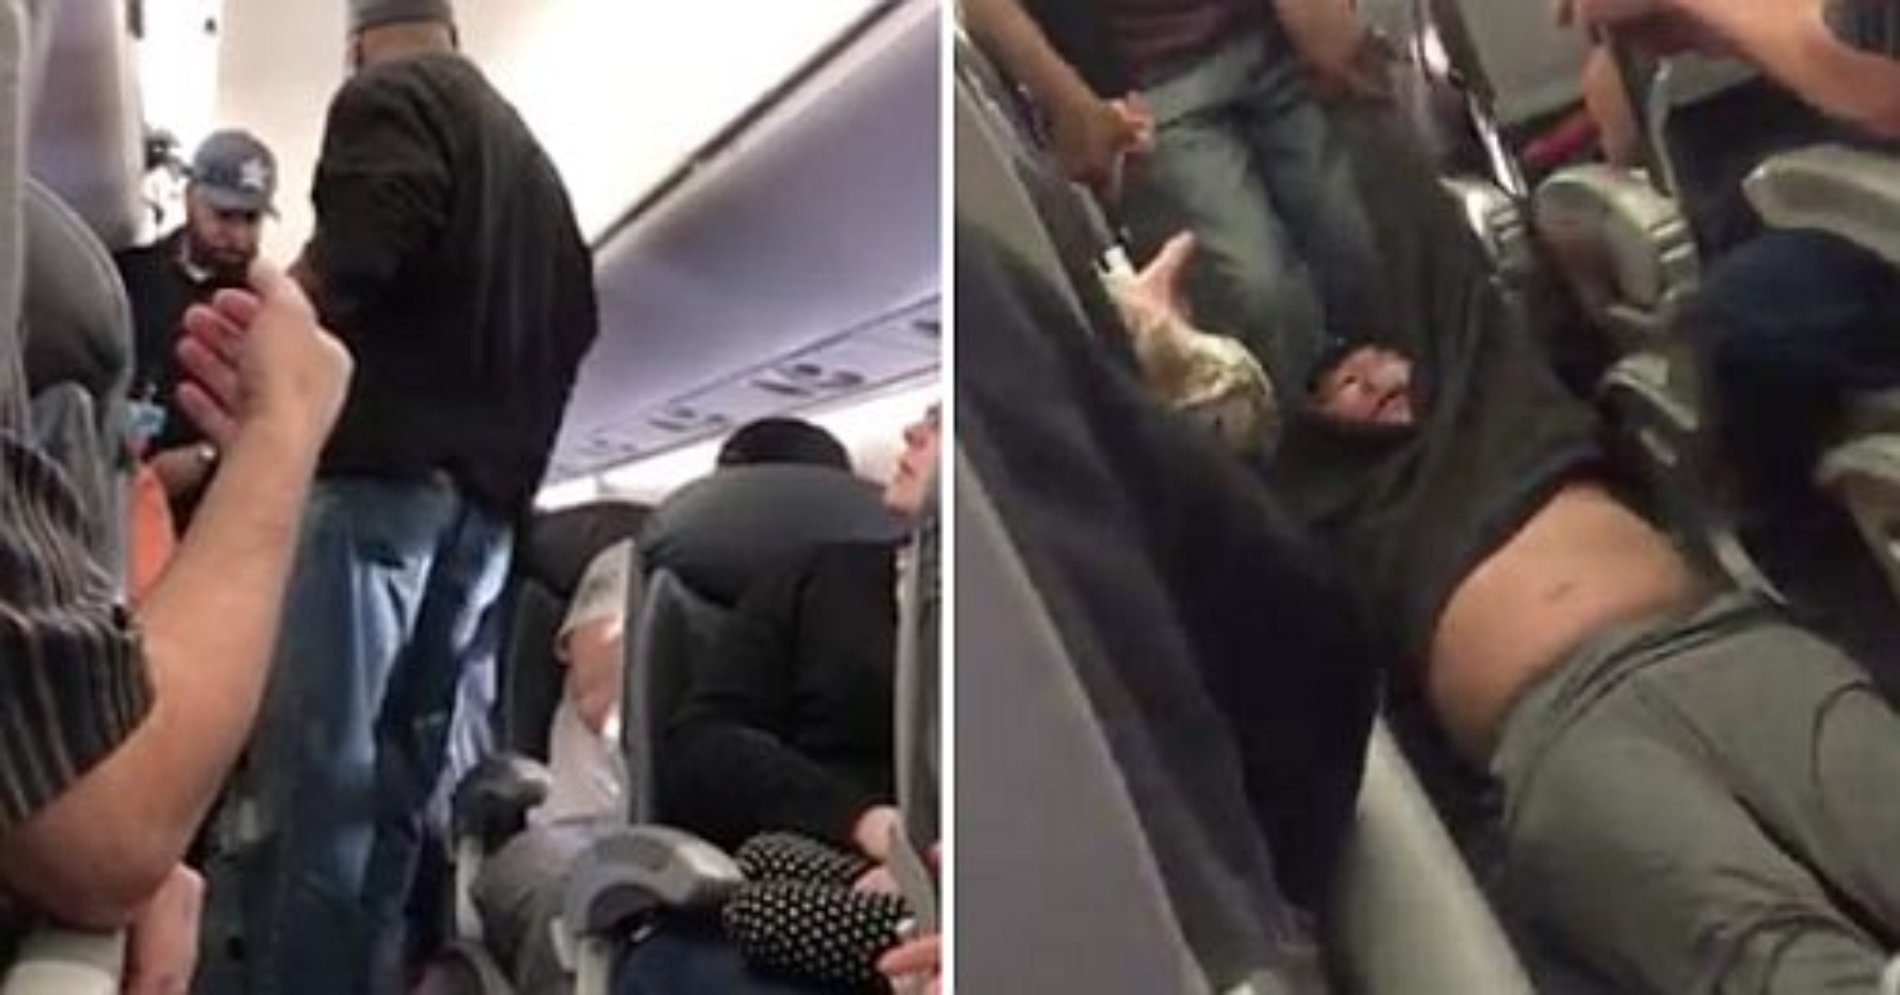 Echan a la fuerza a una persona escogida al azar de United Airlines